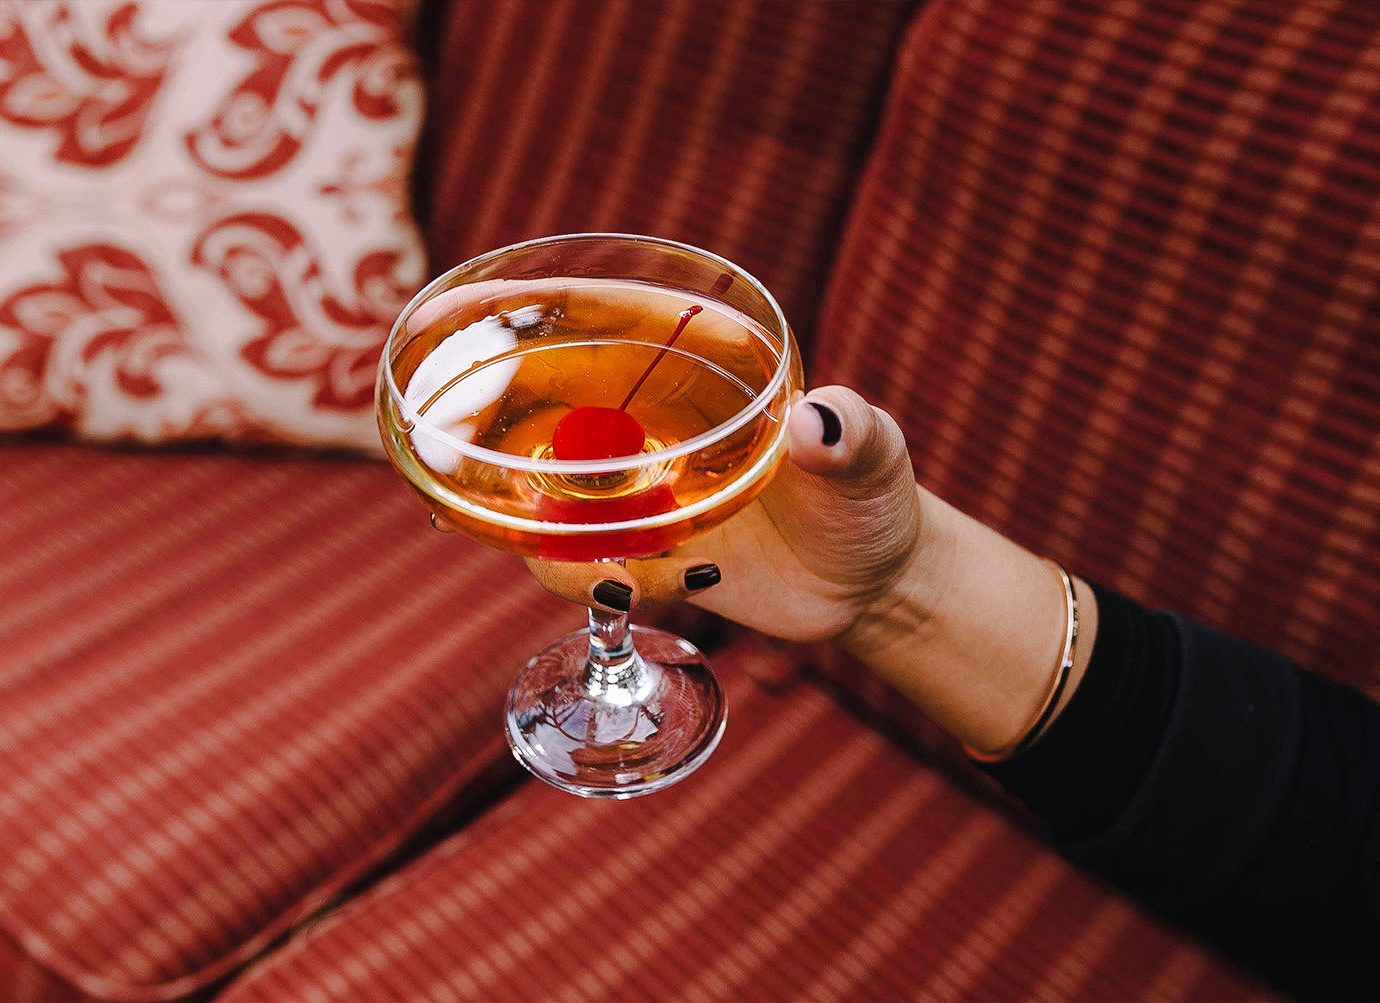 Boutique Hotels Food + Drink Hotels table indoor Drink stemware wine glass liqueur glass beverage tableware striped drinkware